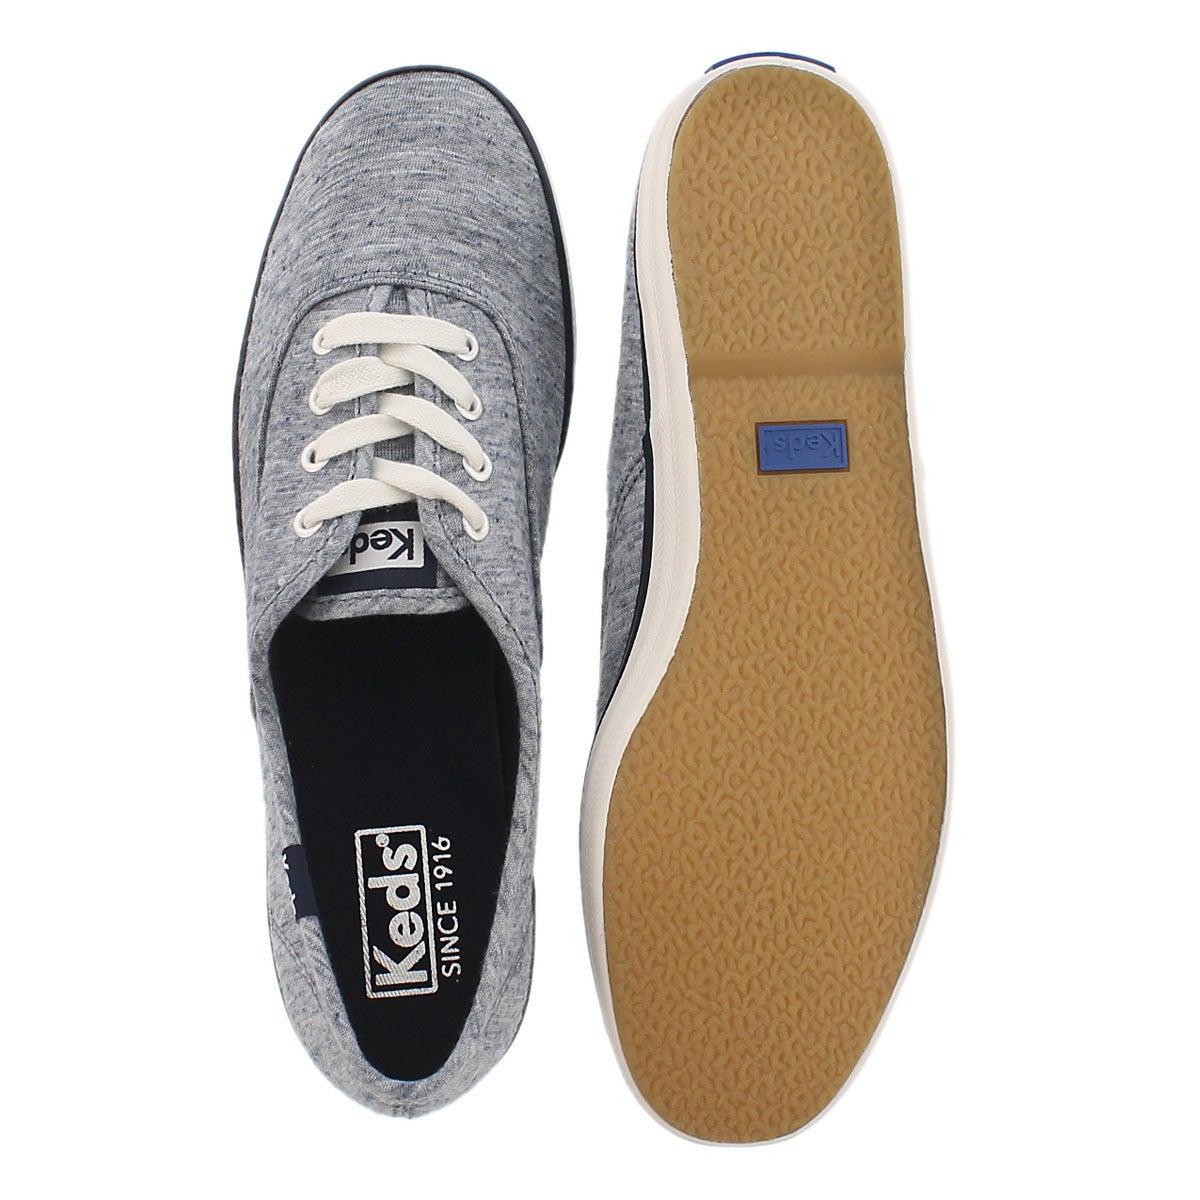 Lds Champion Jersey blue sneaker